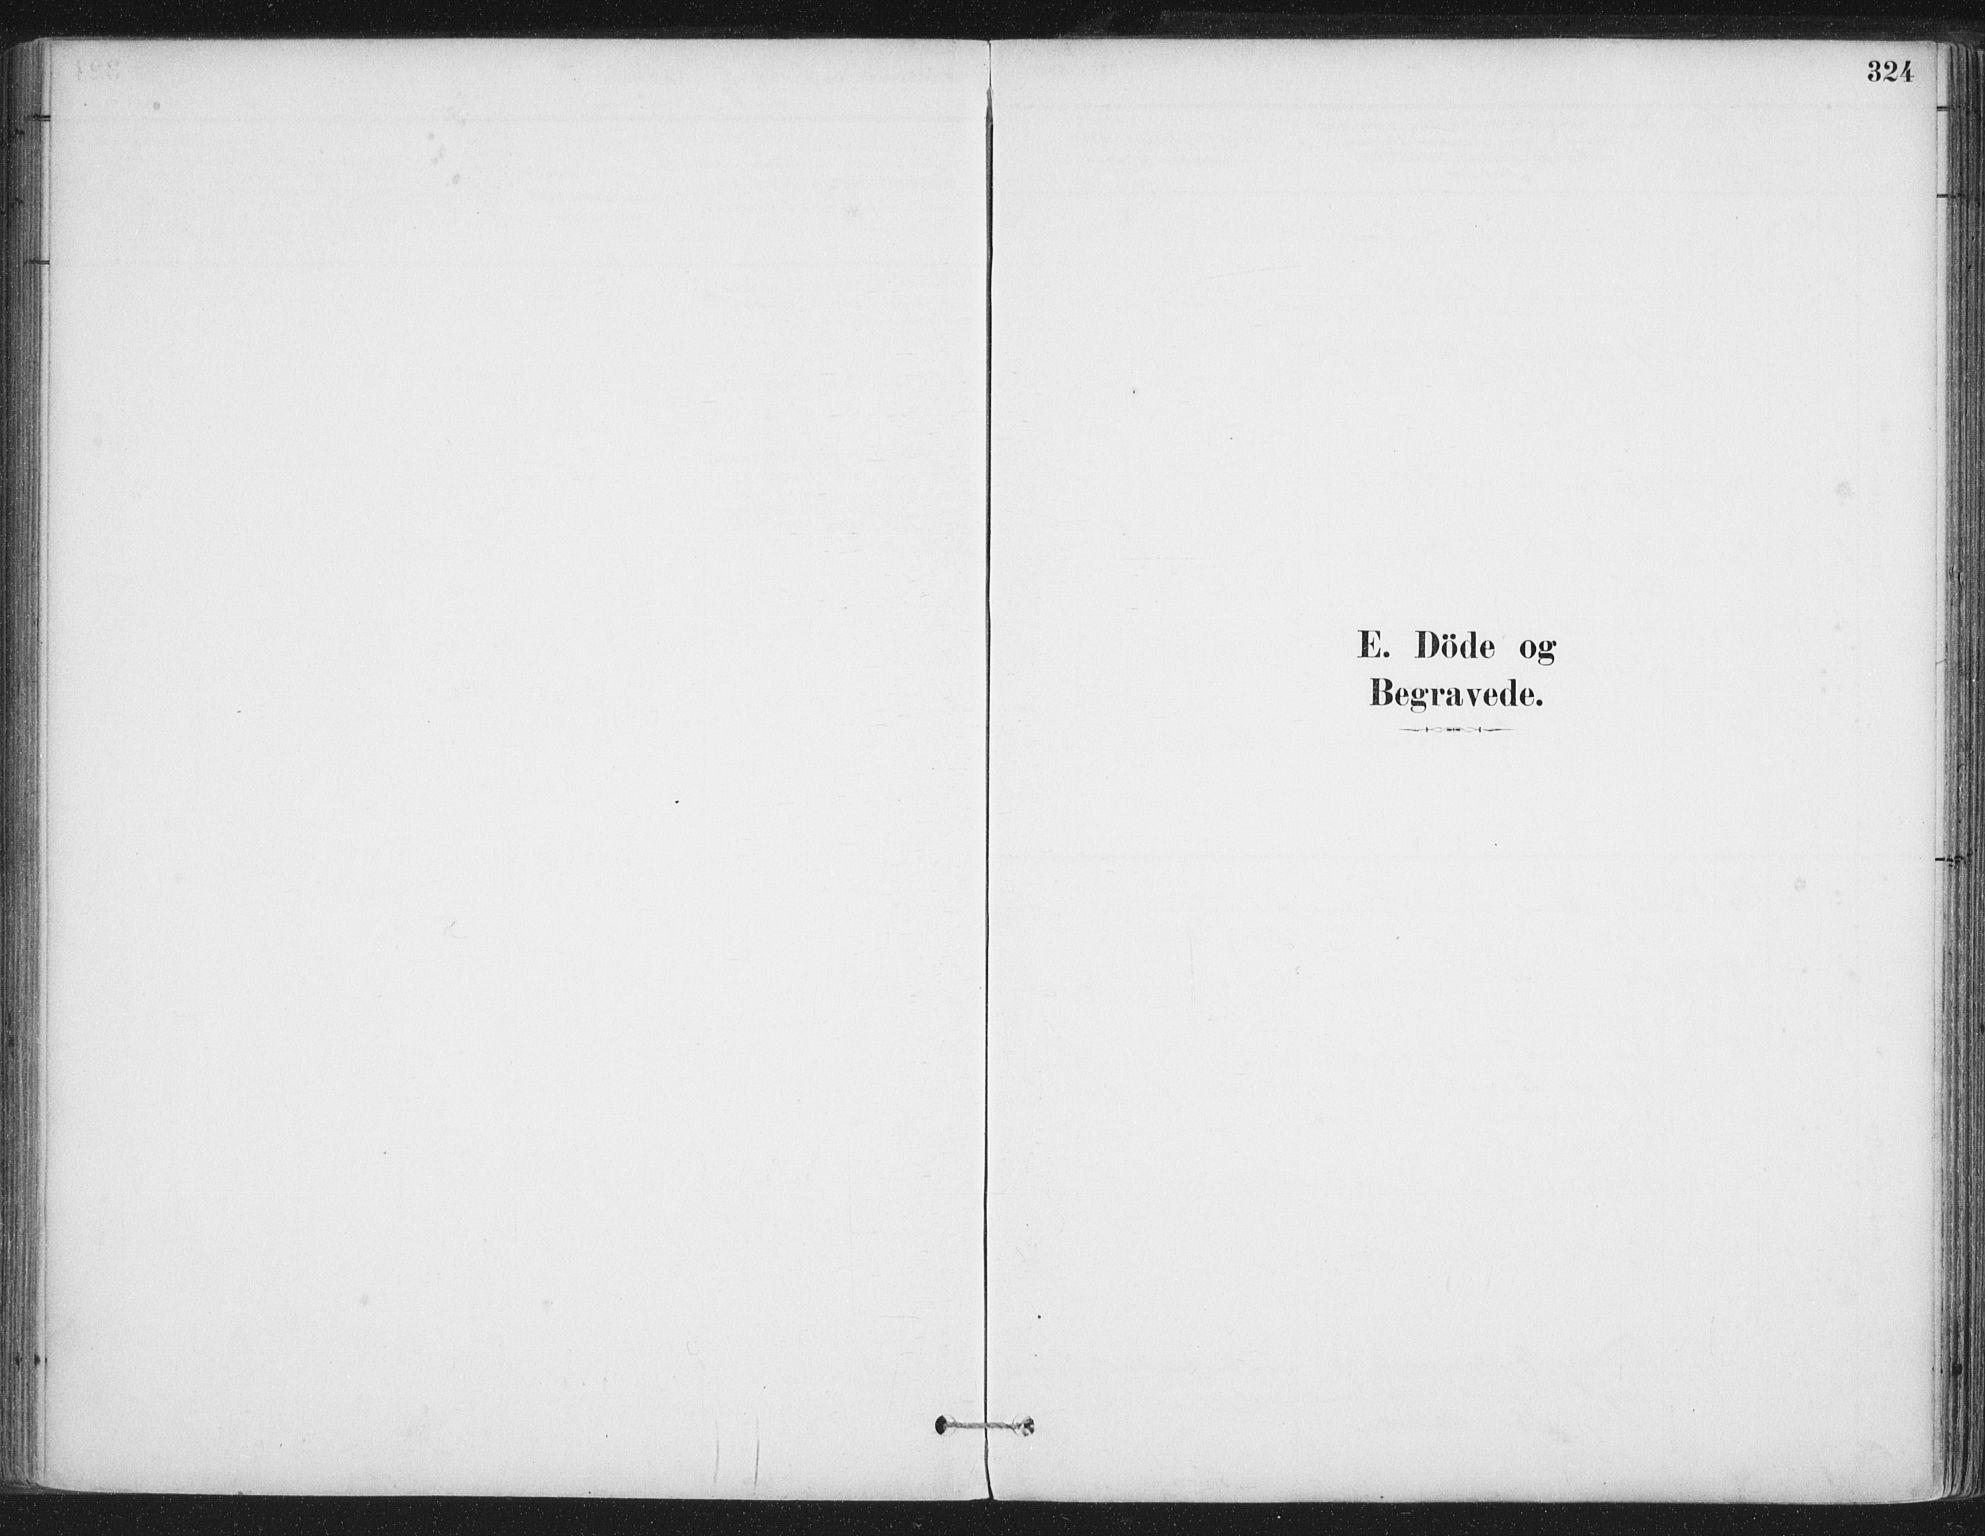 SAT, Ministerialprotokoller, klokkerbøker og fødselsregistre - Nordland, 888/L1244: Ministerialbok nr. 888A10, 1880-1890, s. 324